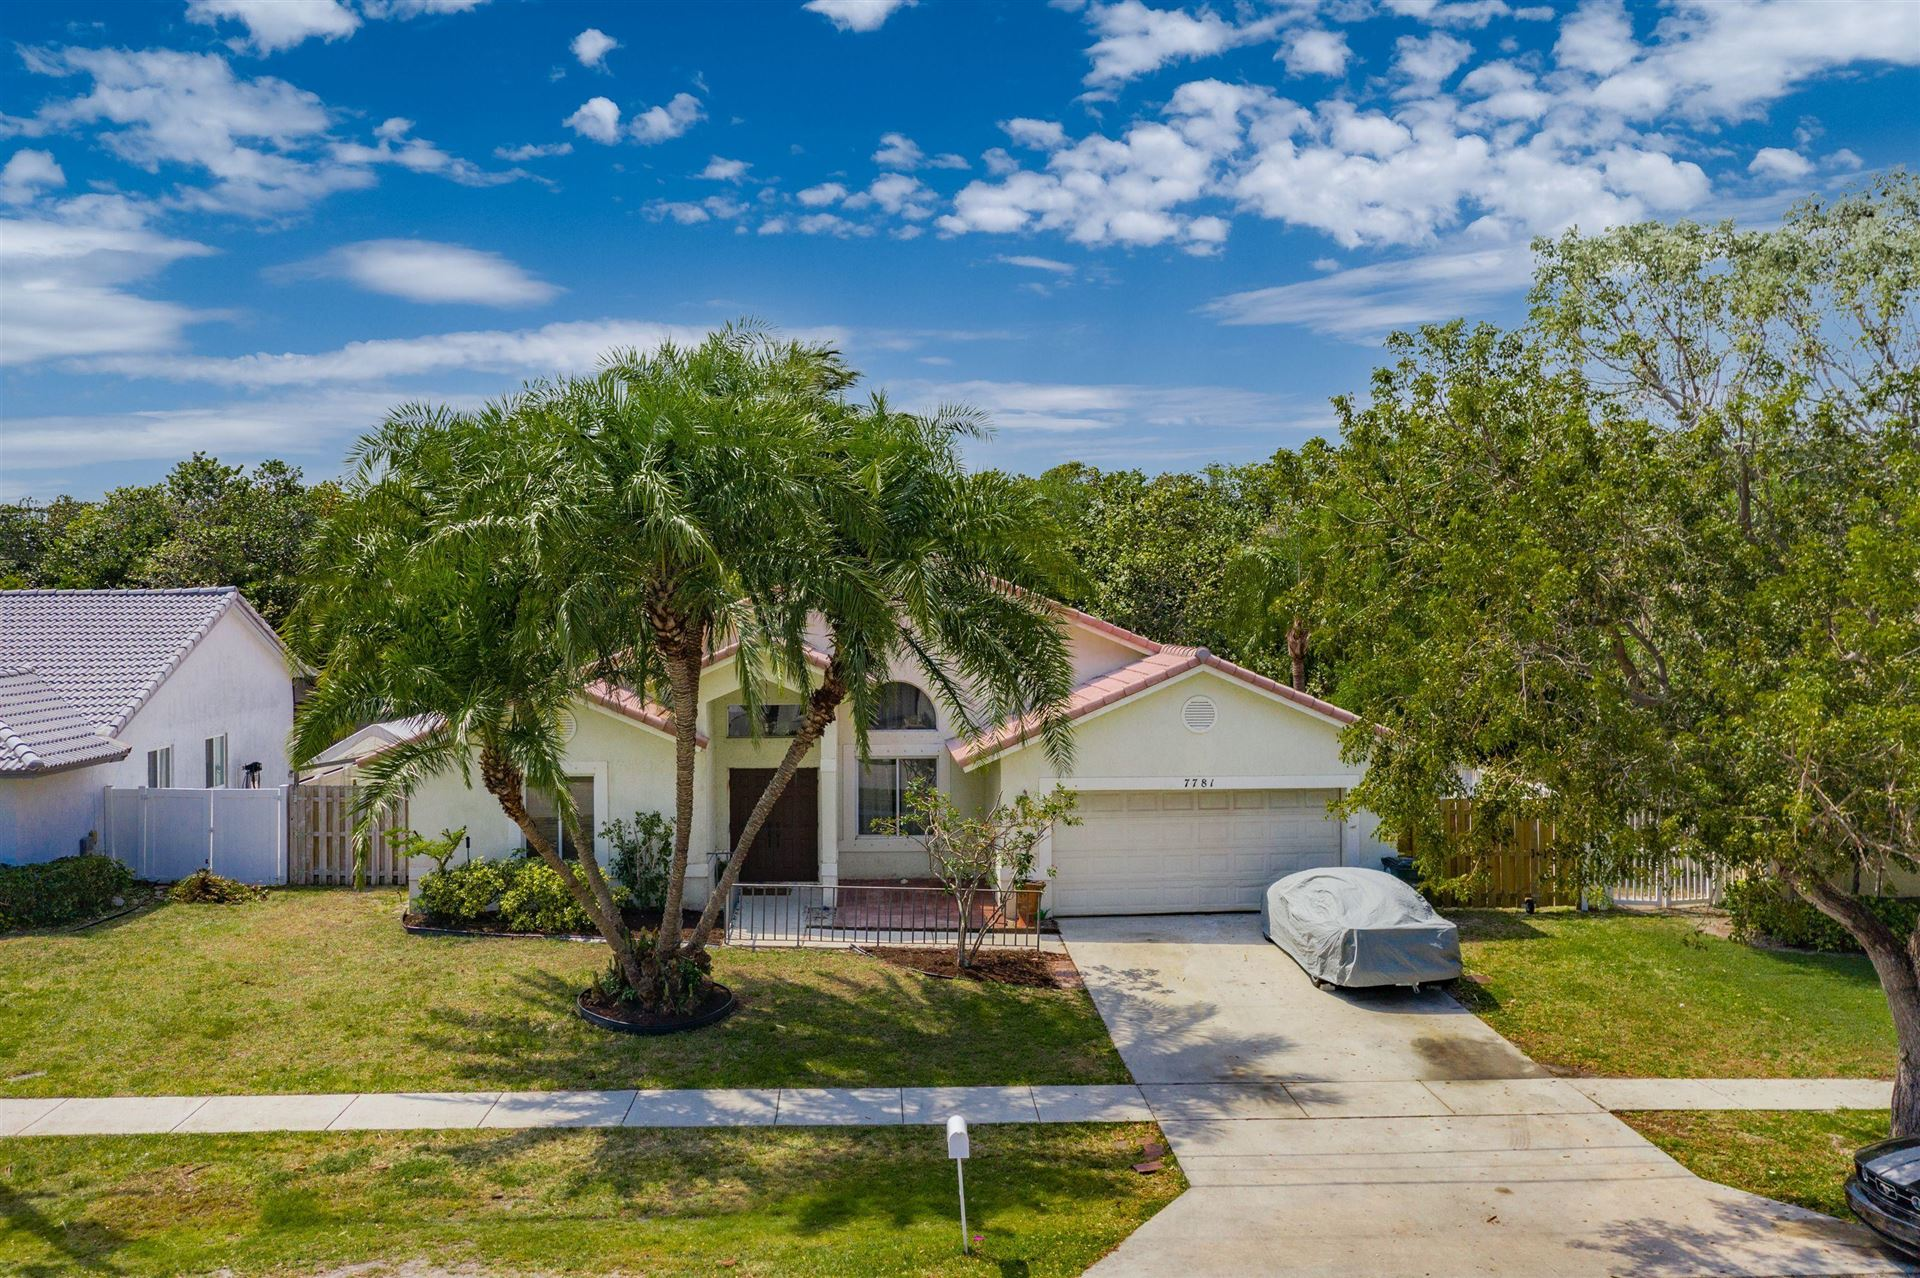 7781 Texas Trail, Boca Raton, FL 33487 - #: RX-10703050